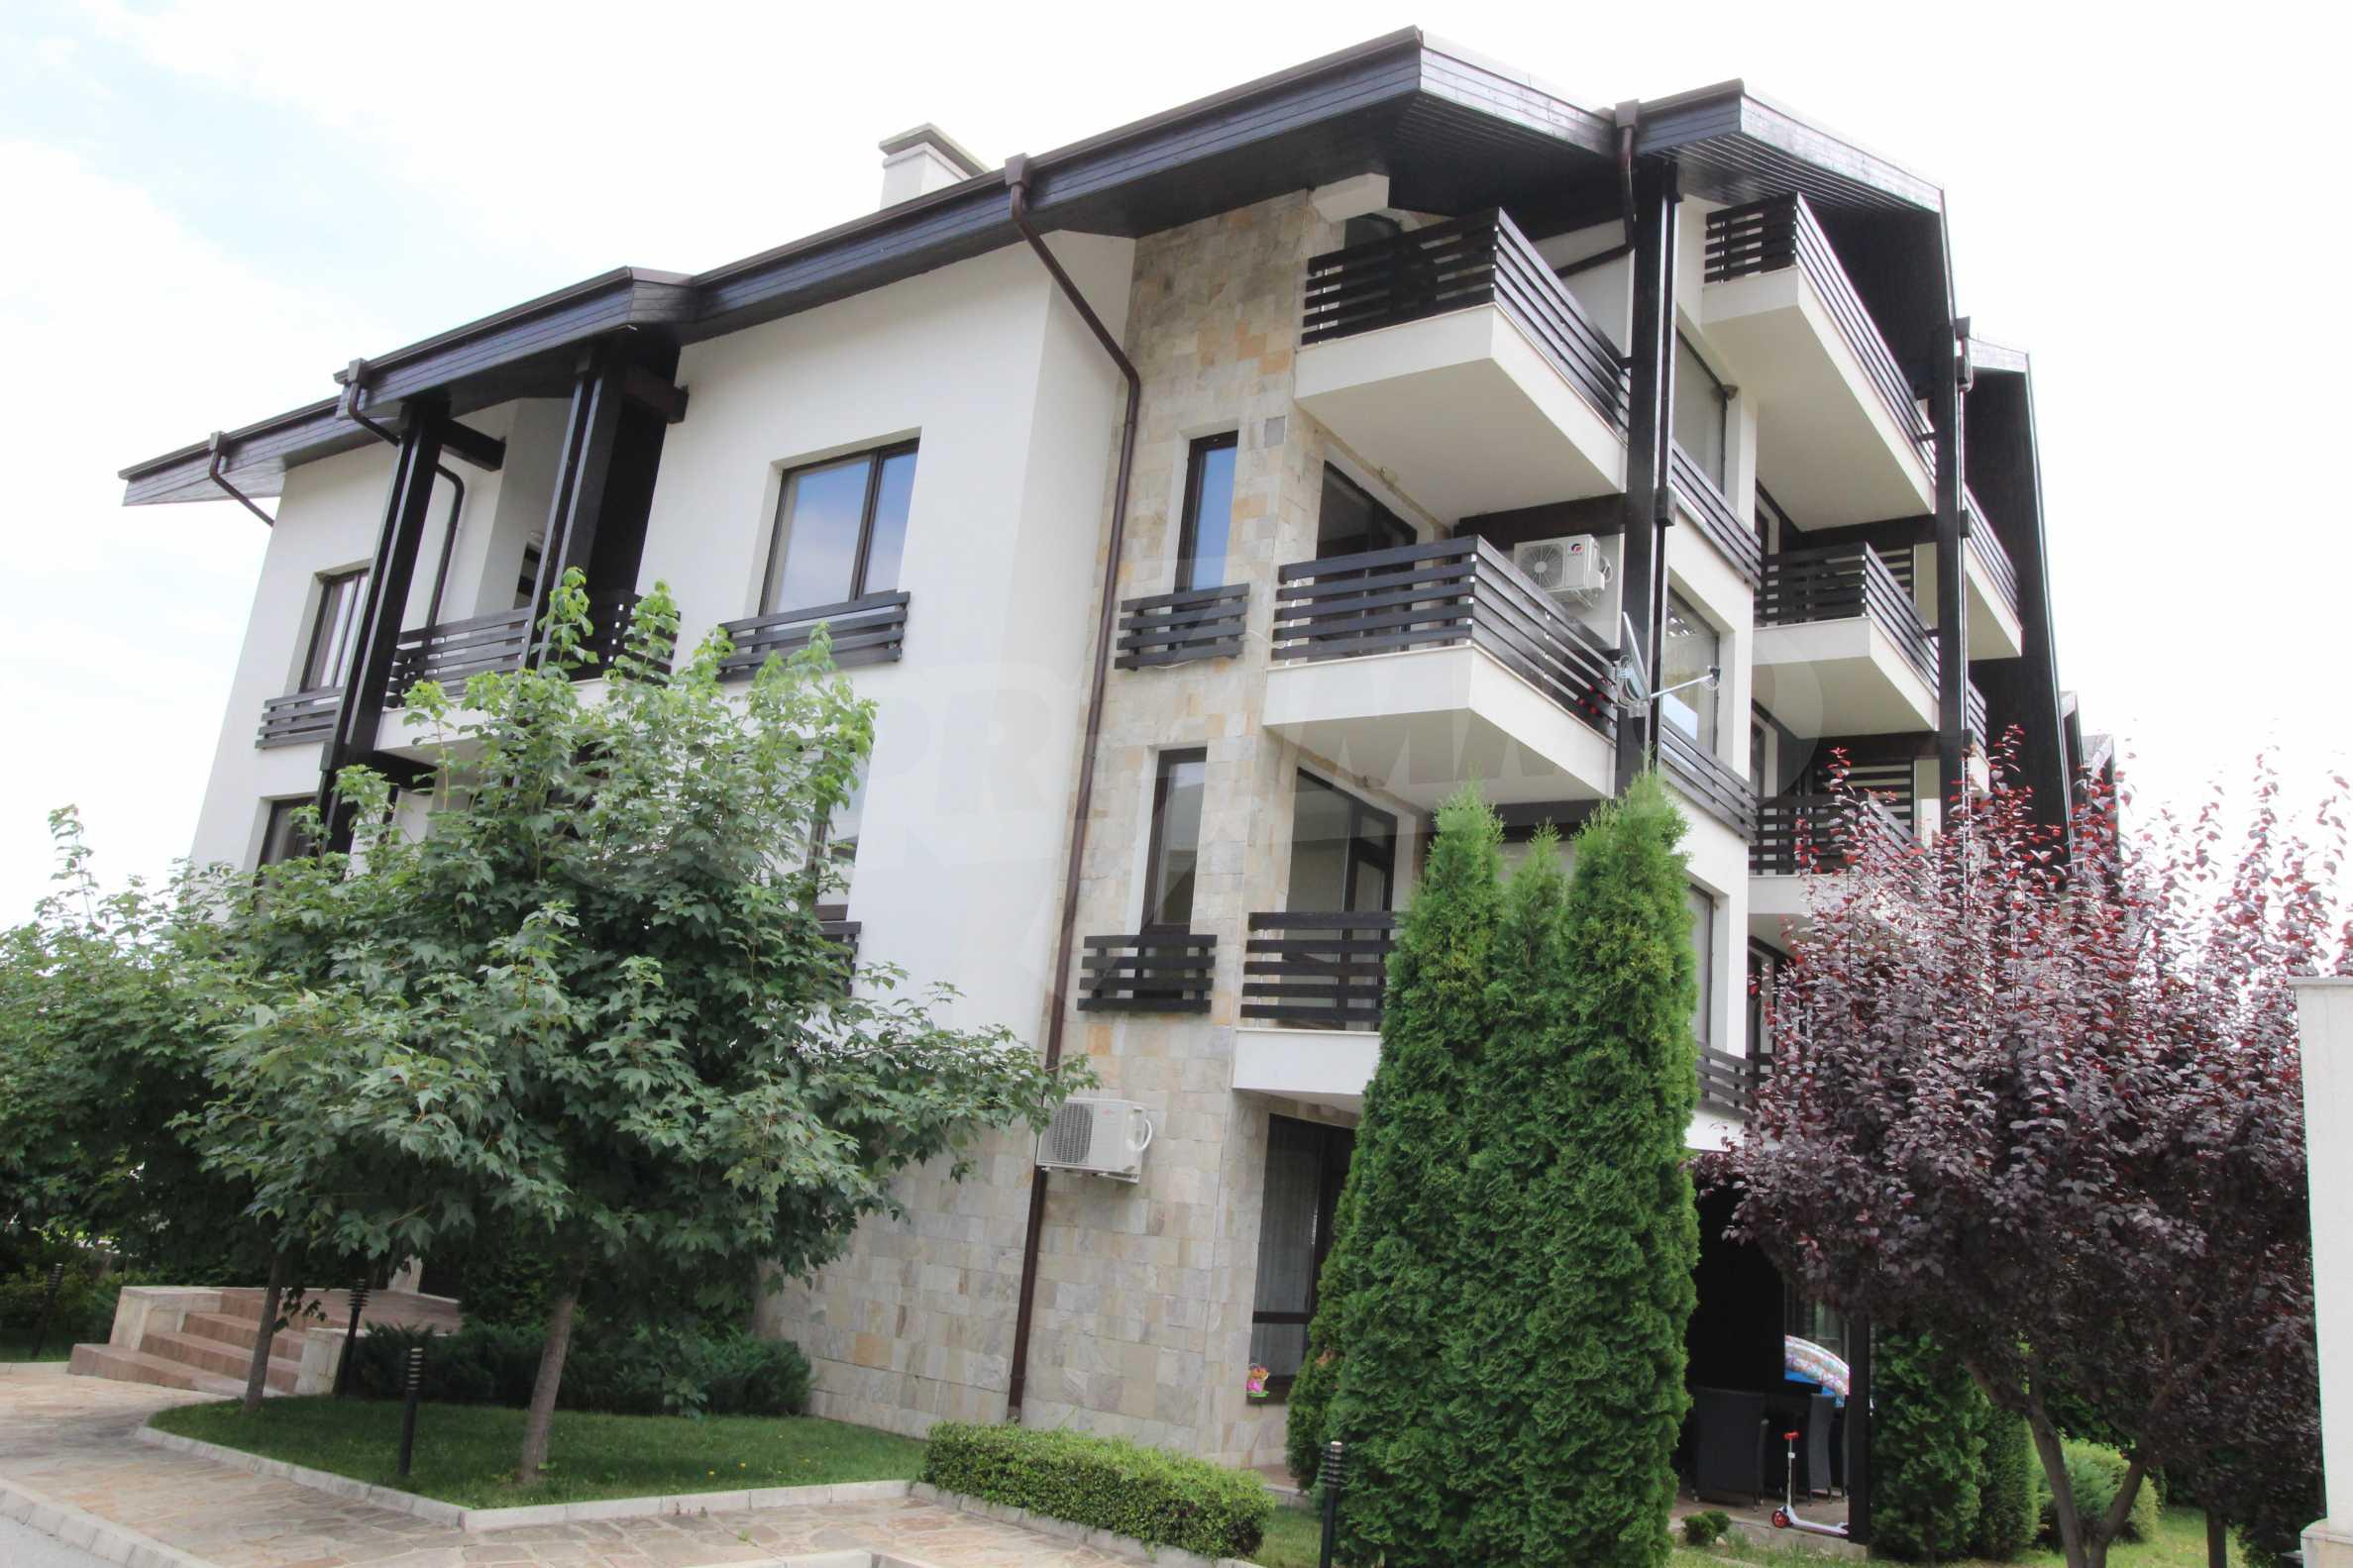 Стилен апартамент в близост до ски курорта Банско 3